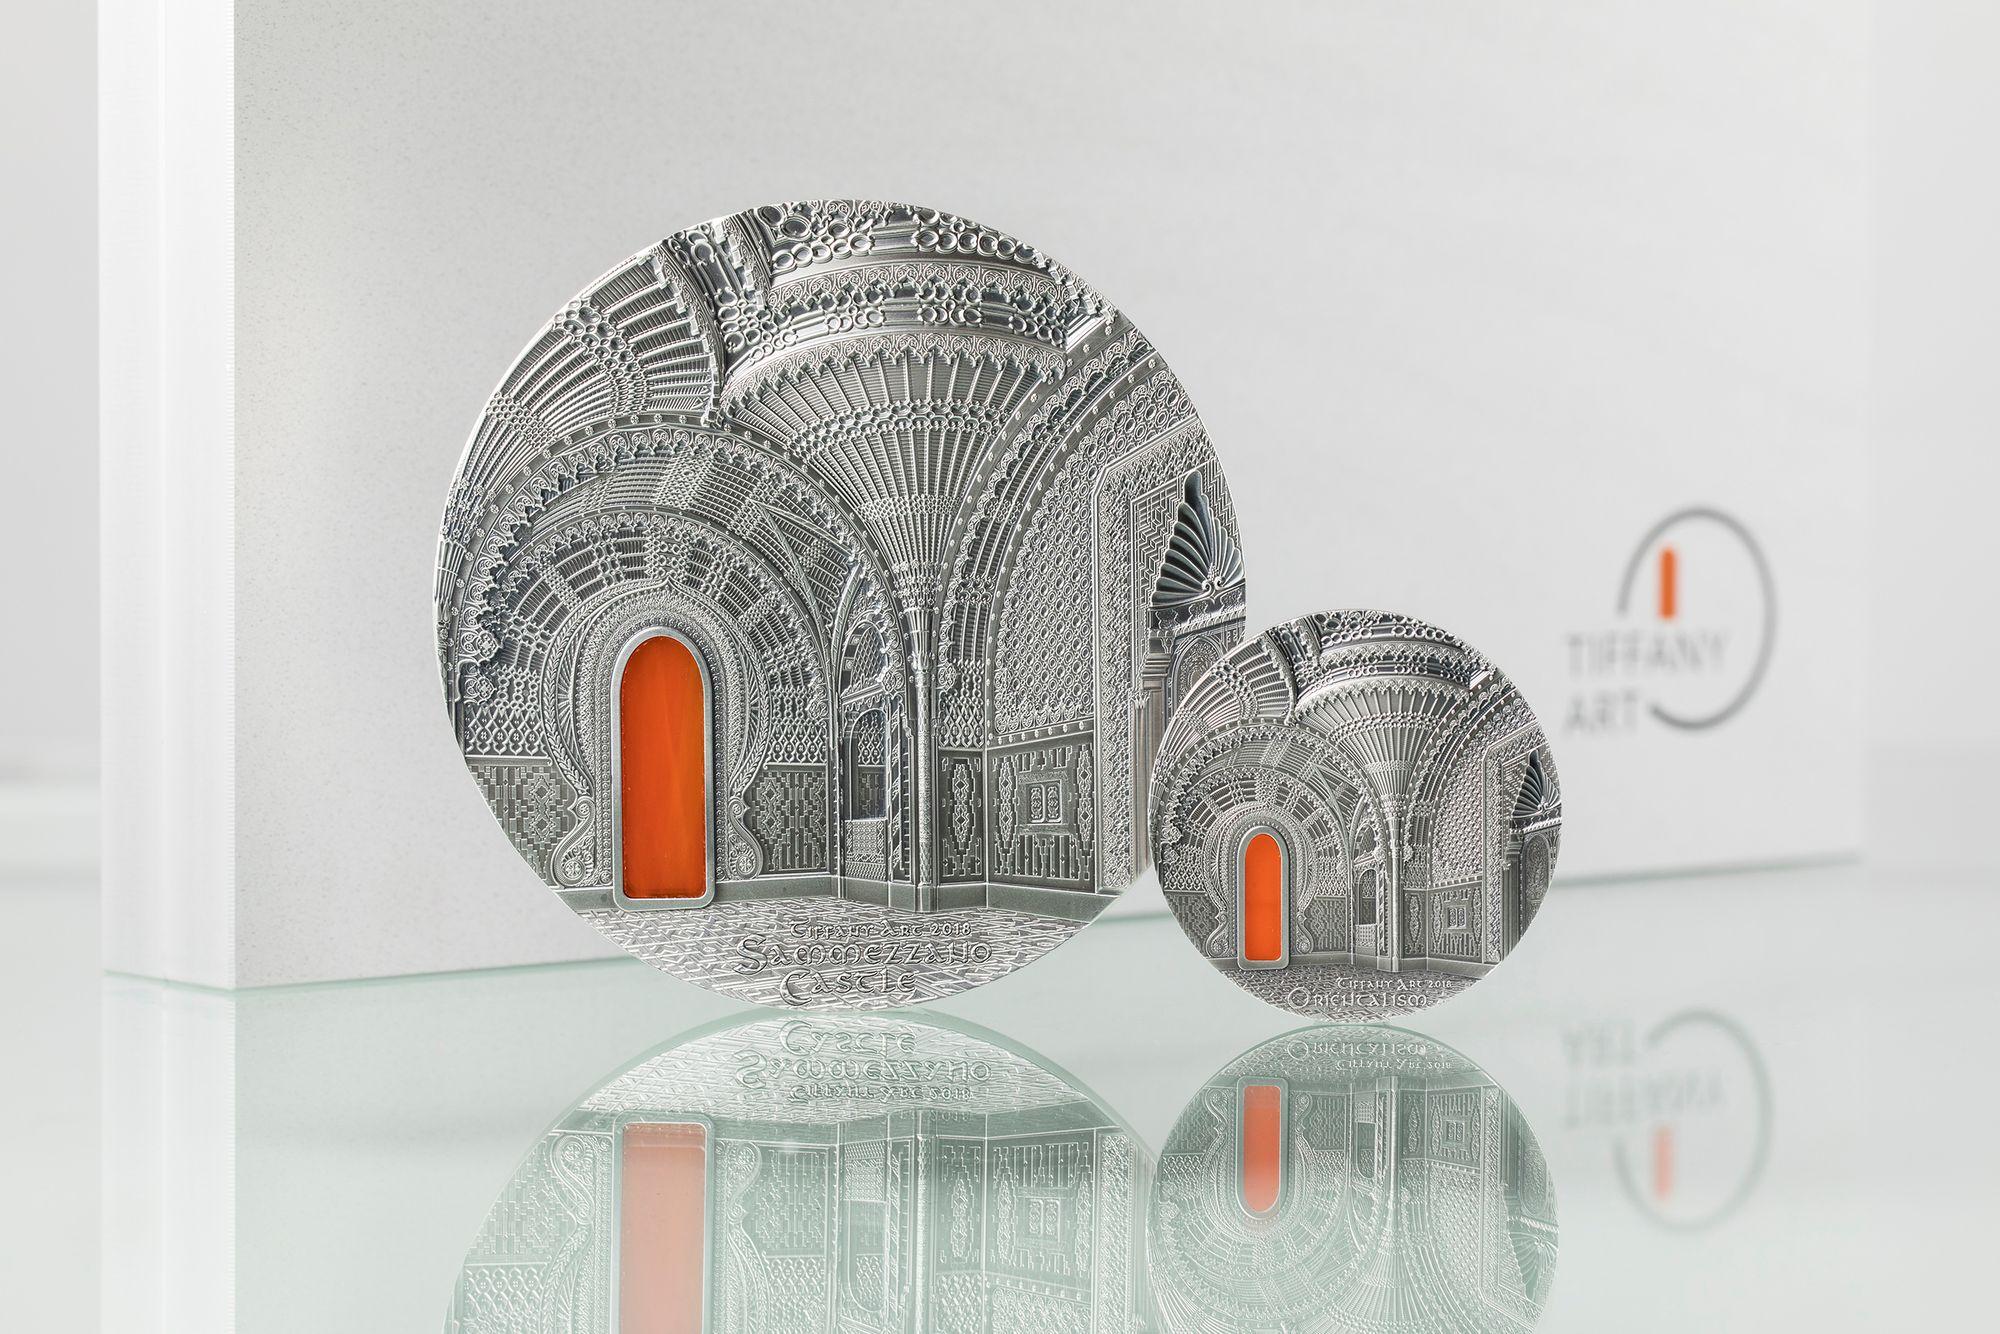 2018 Tiffany Art Orientalism 2oz and Sammezzano 1 Kilo Silver Coins